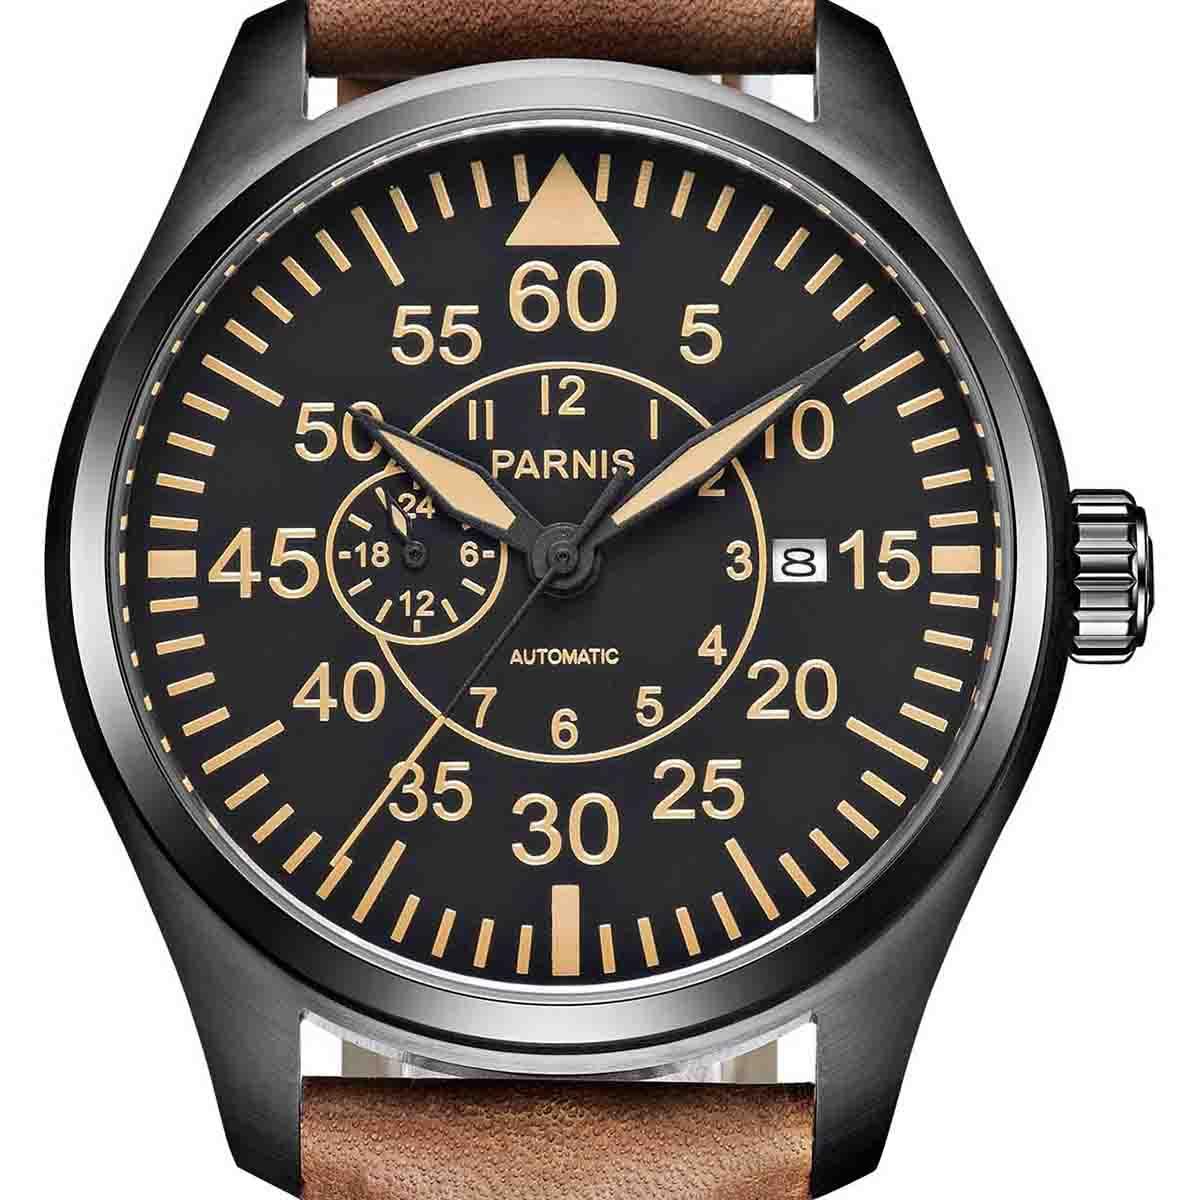 【NEW】PARNIS パーニス 自動巻き 腕時計 [PA6063-S4AL-BKBR] 並行輸入品 純正ケース メーカー保証12ヶ月